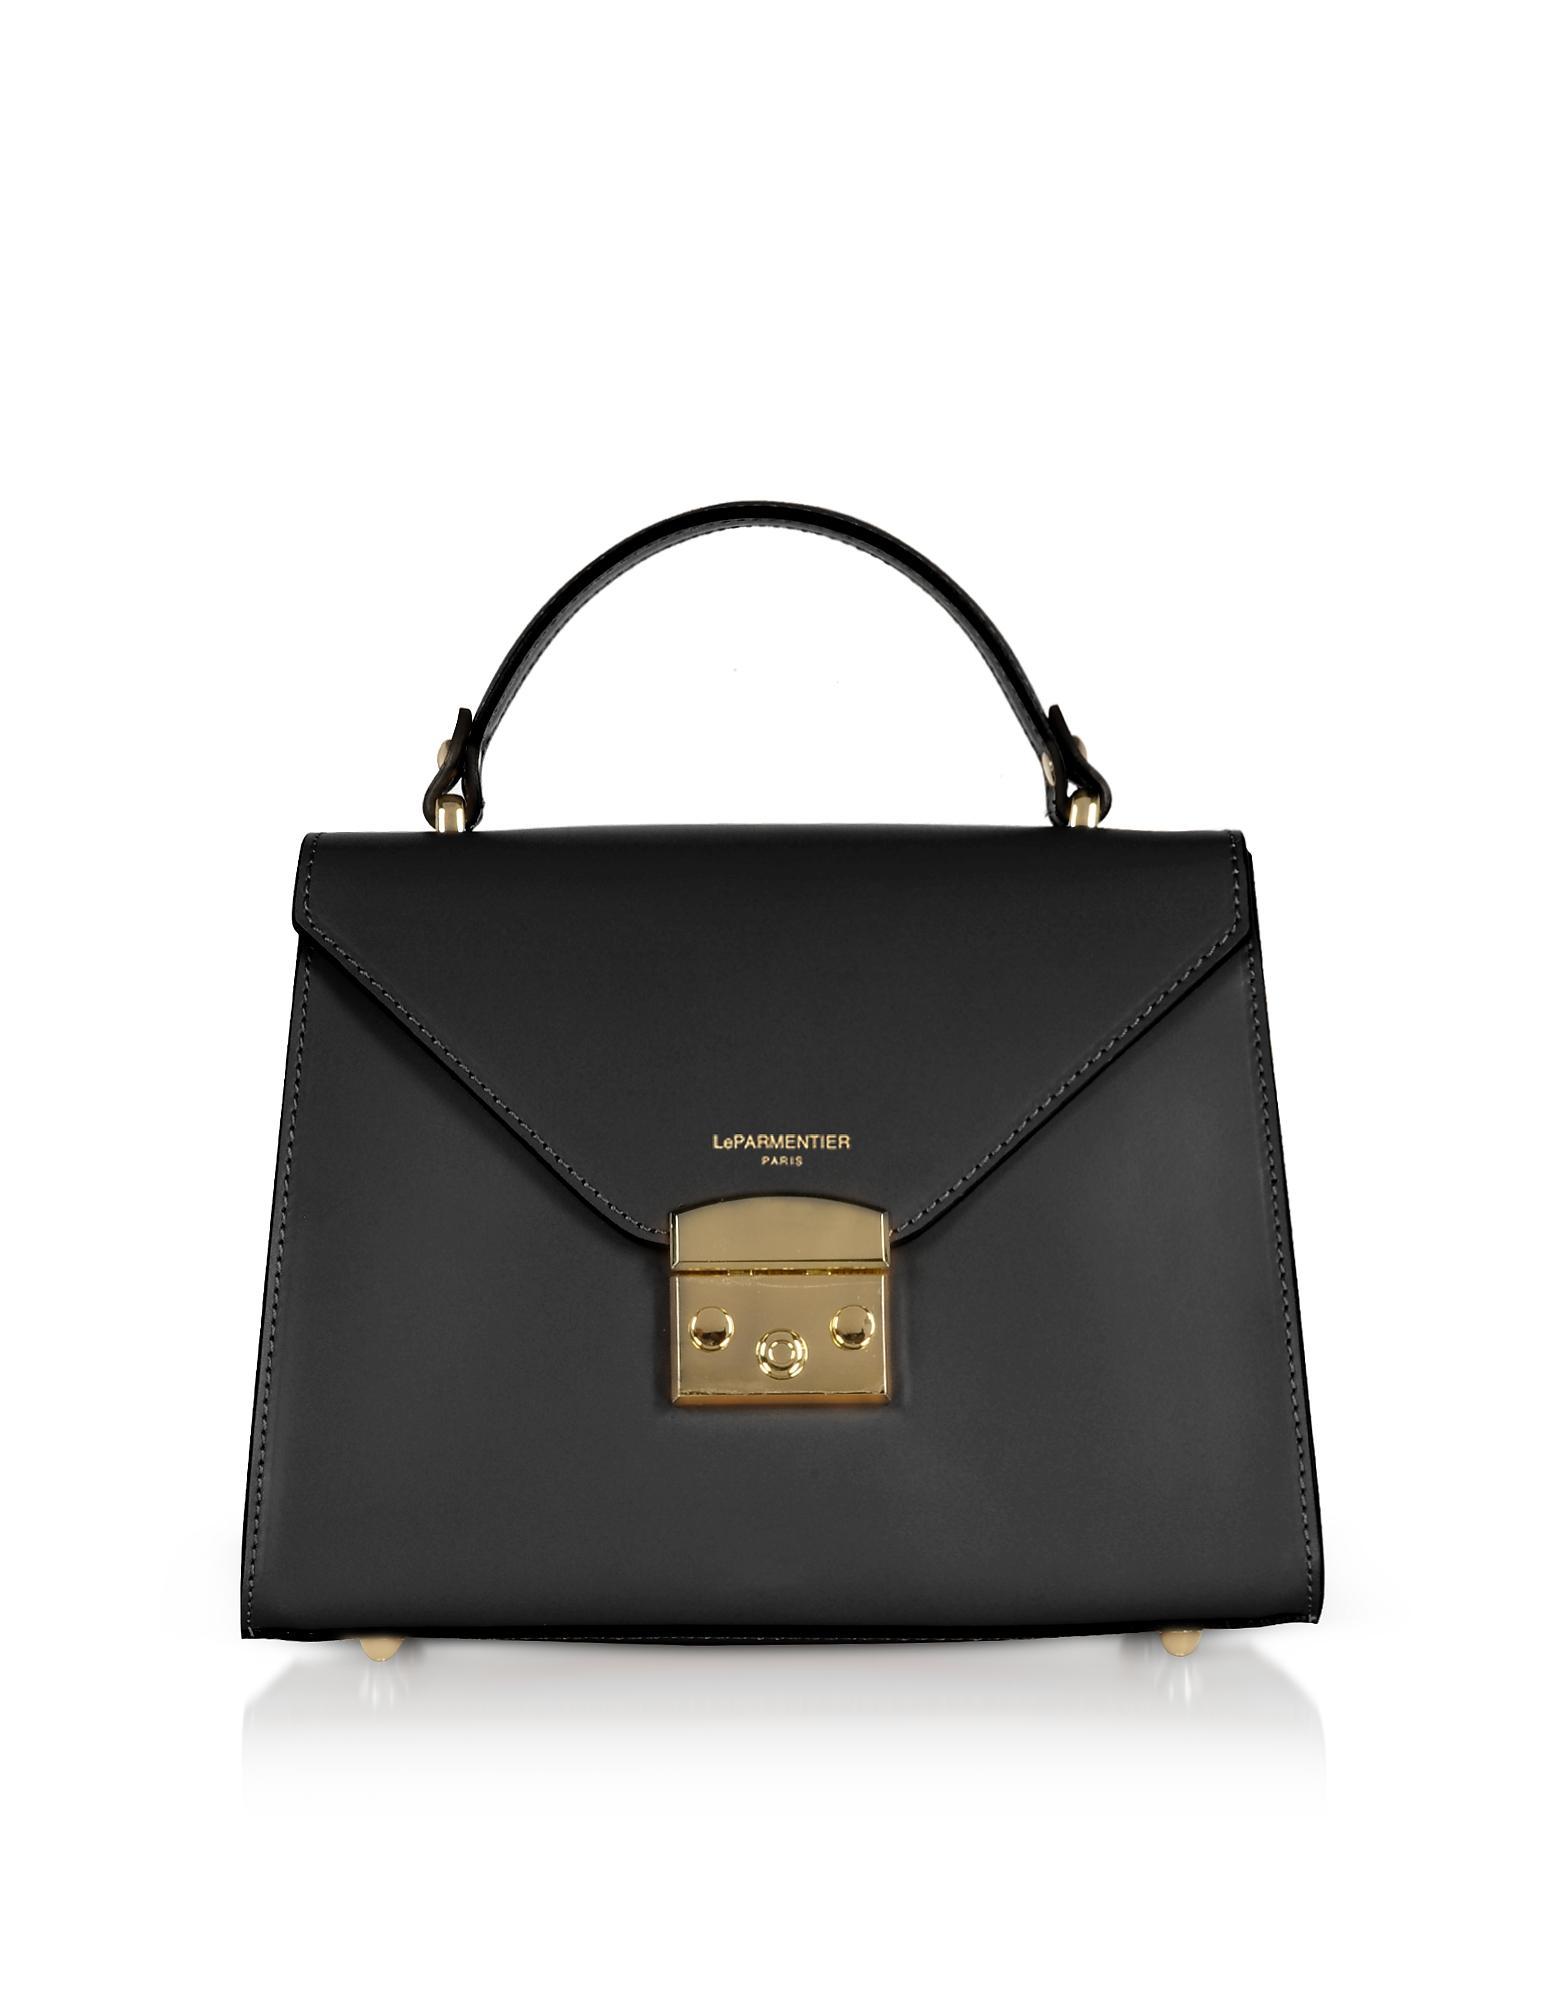 1193dc6bc5f1 Le Parmentier Peggy Leather Top Handle Satchel Bag in Black - Lyst